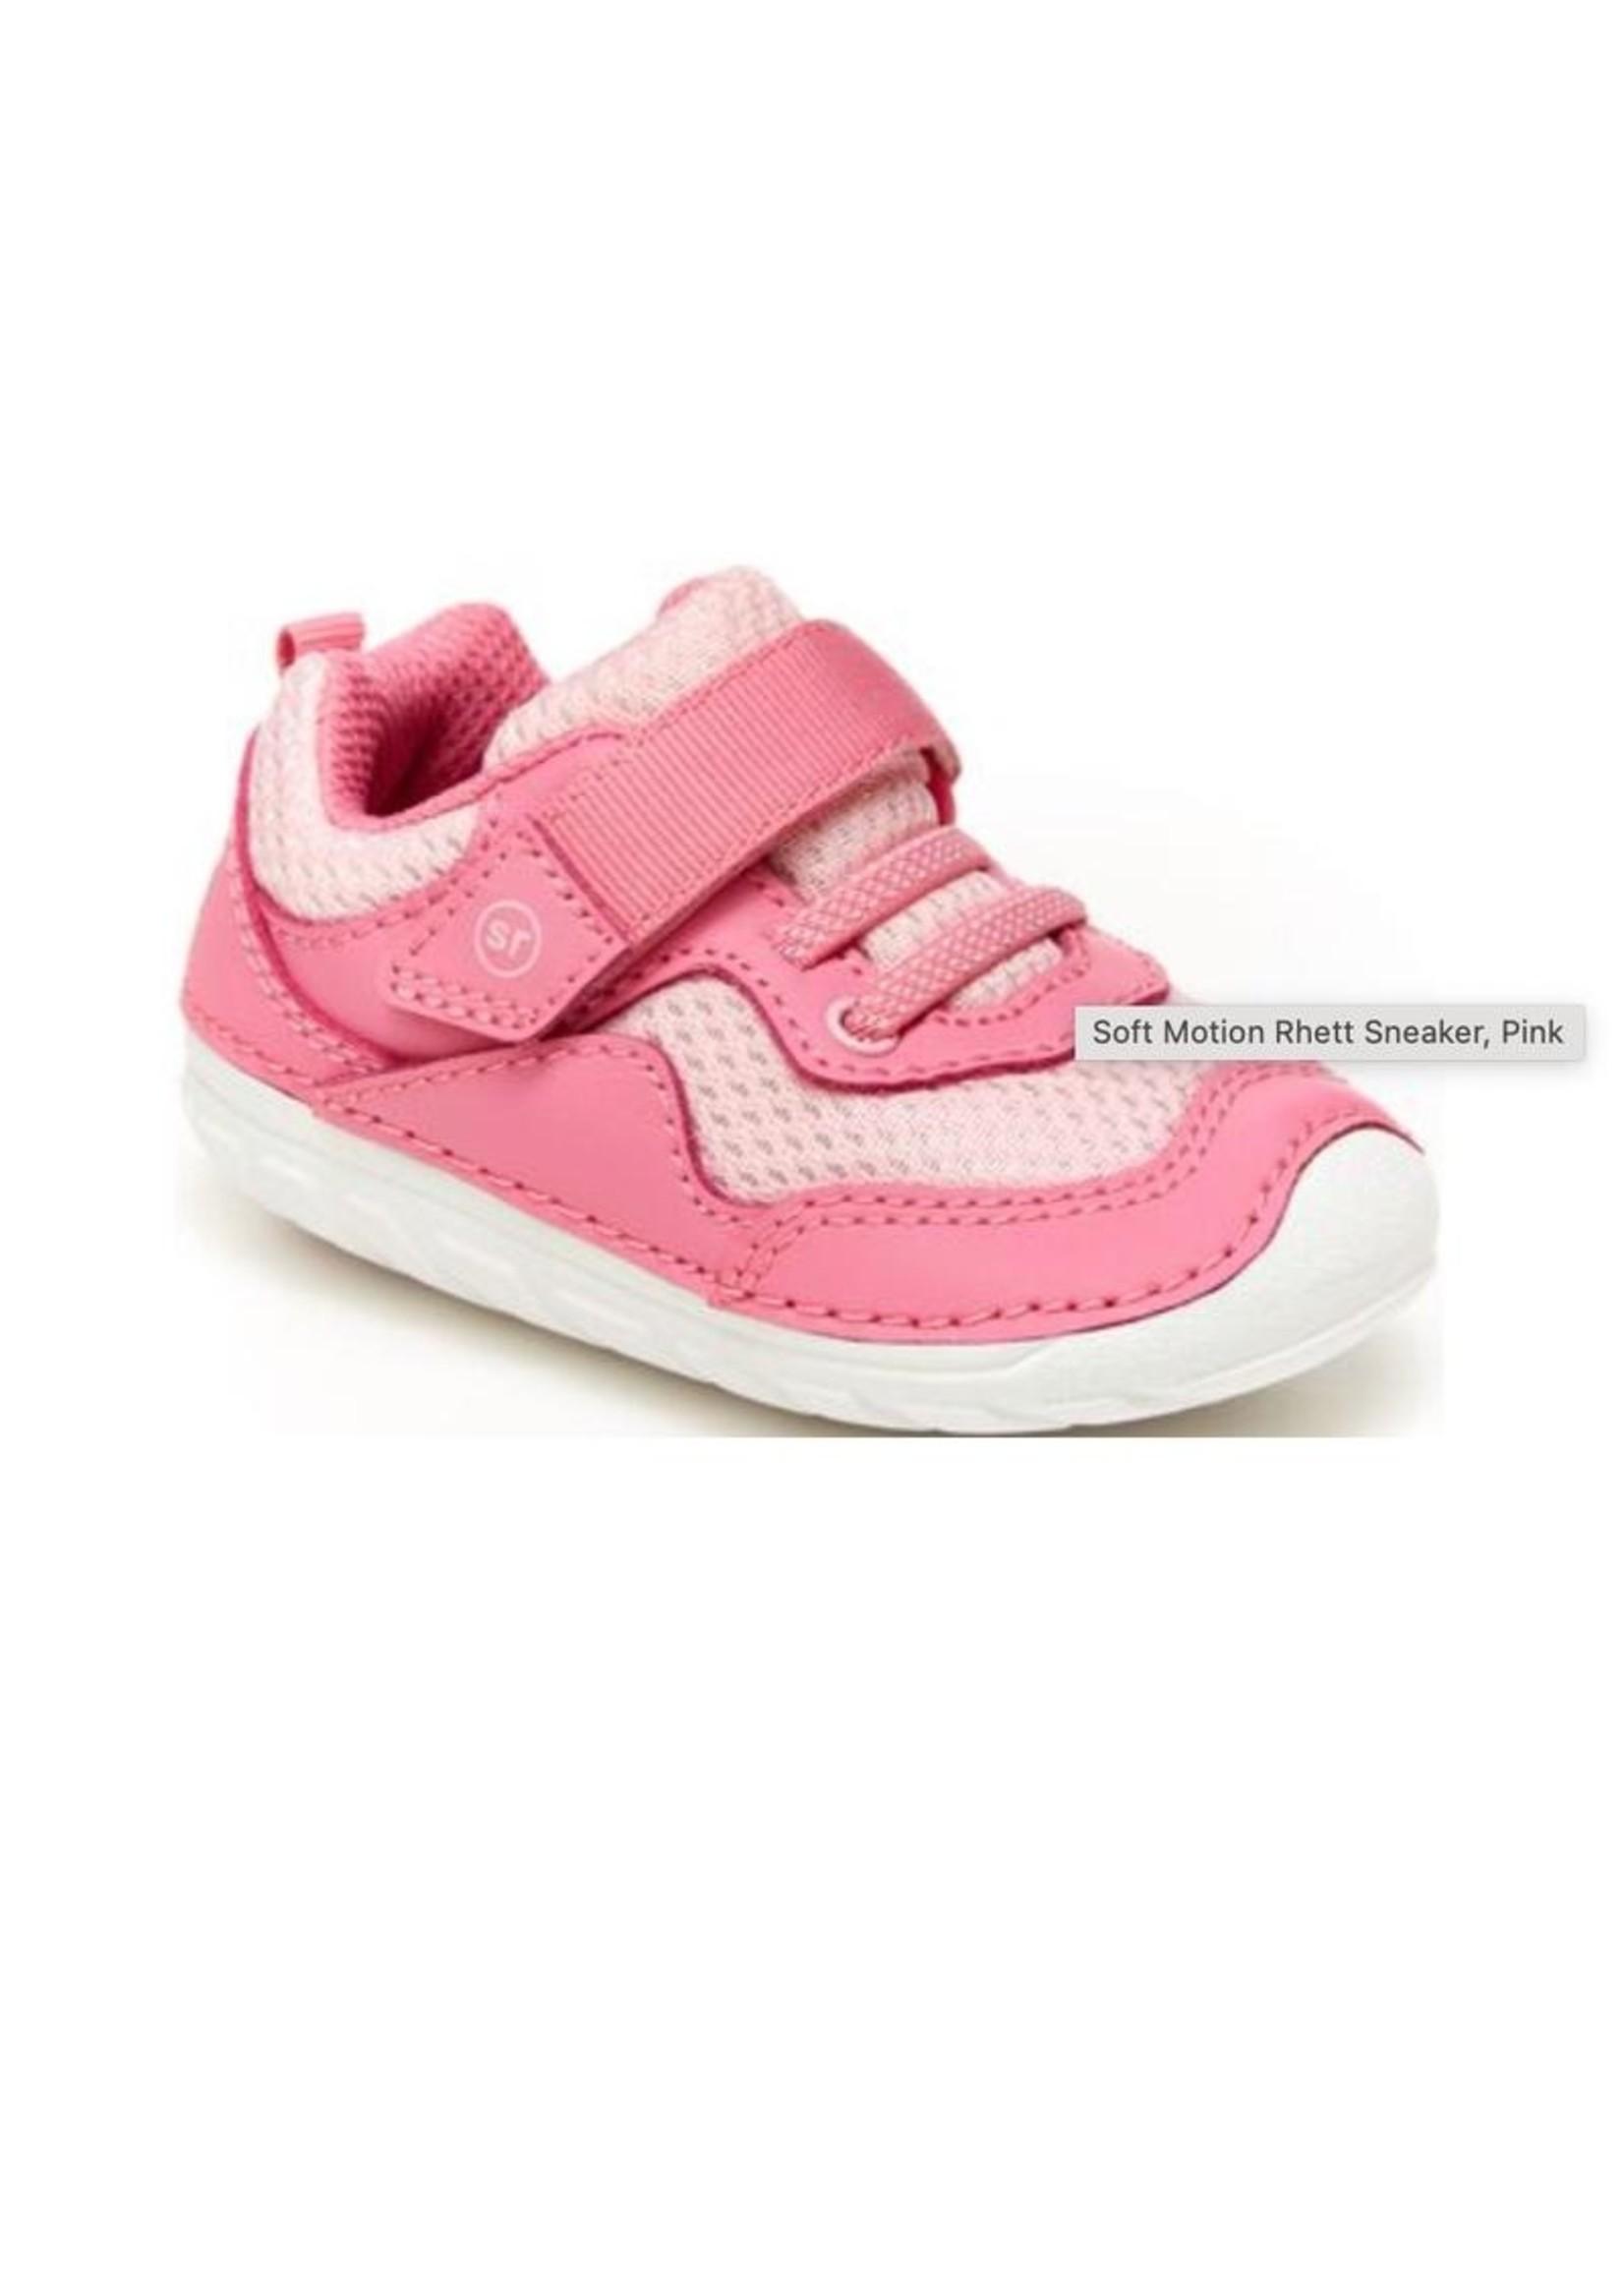 Striderite Stride Rite, Soft Motion Rhett Sneaker in Pink